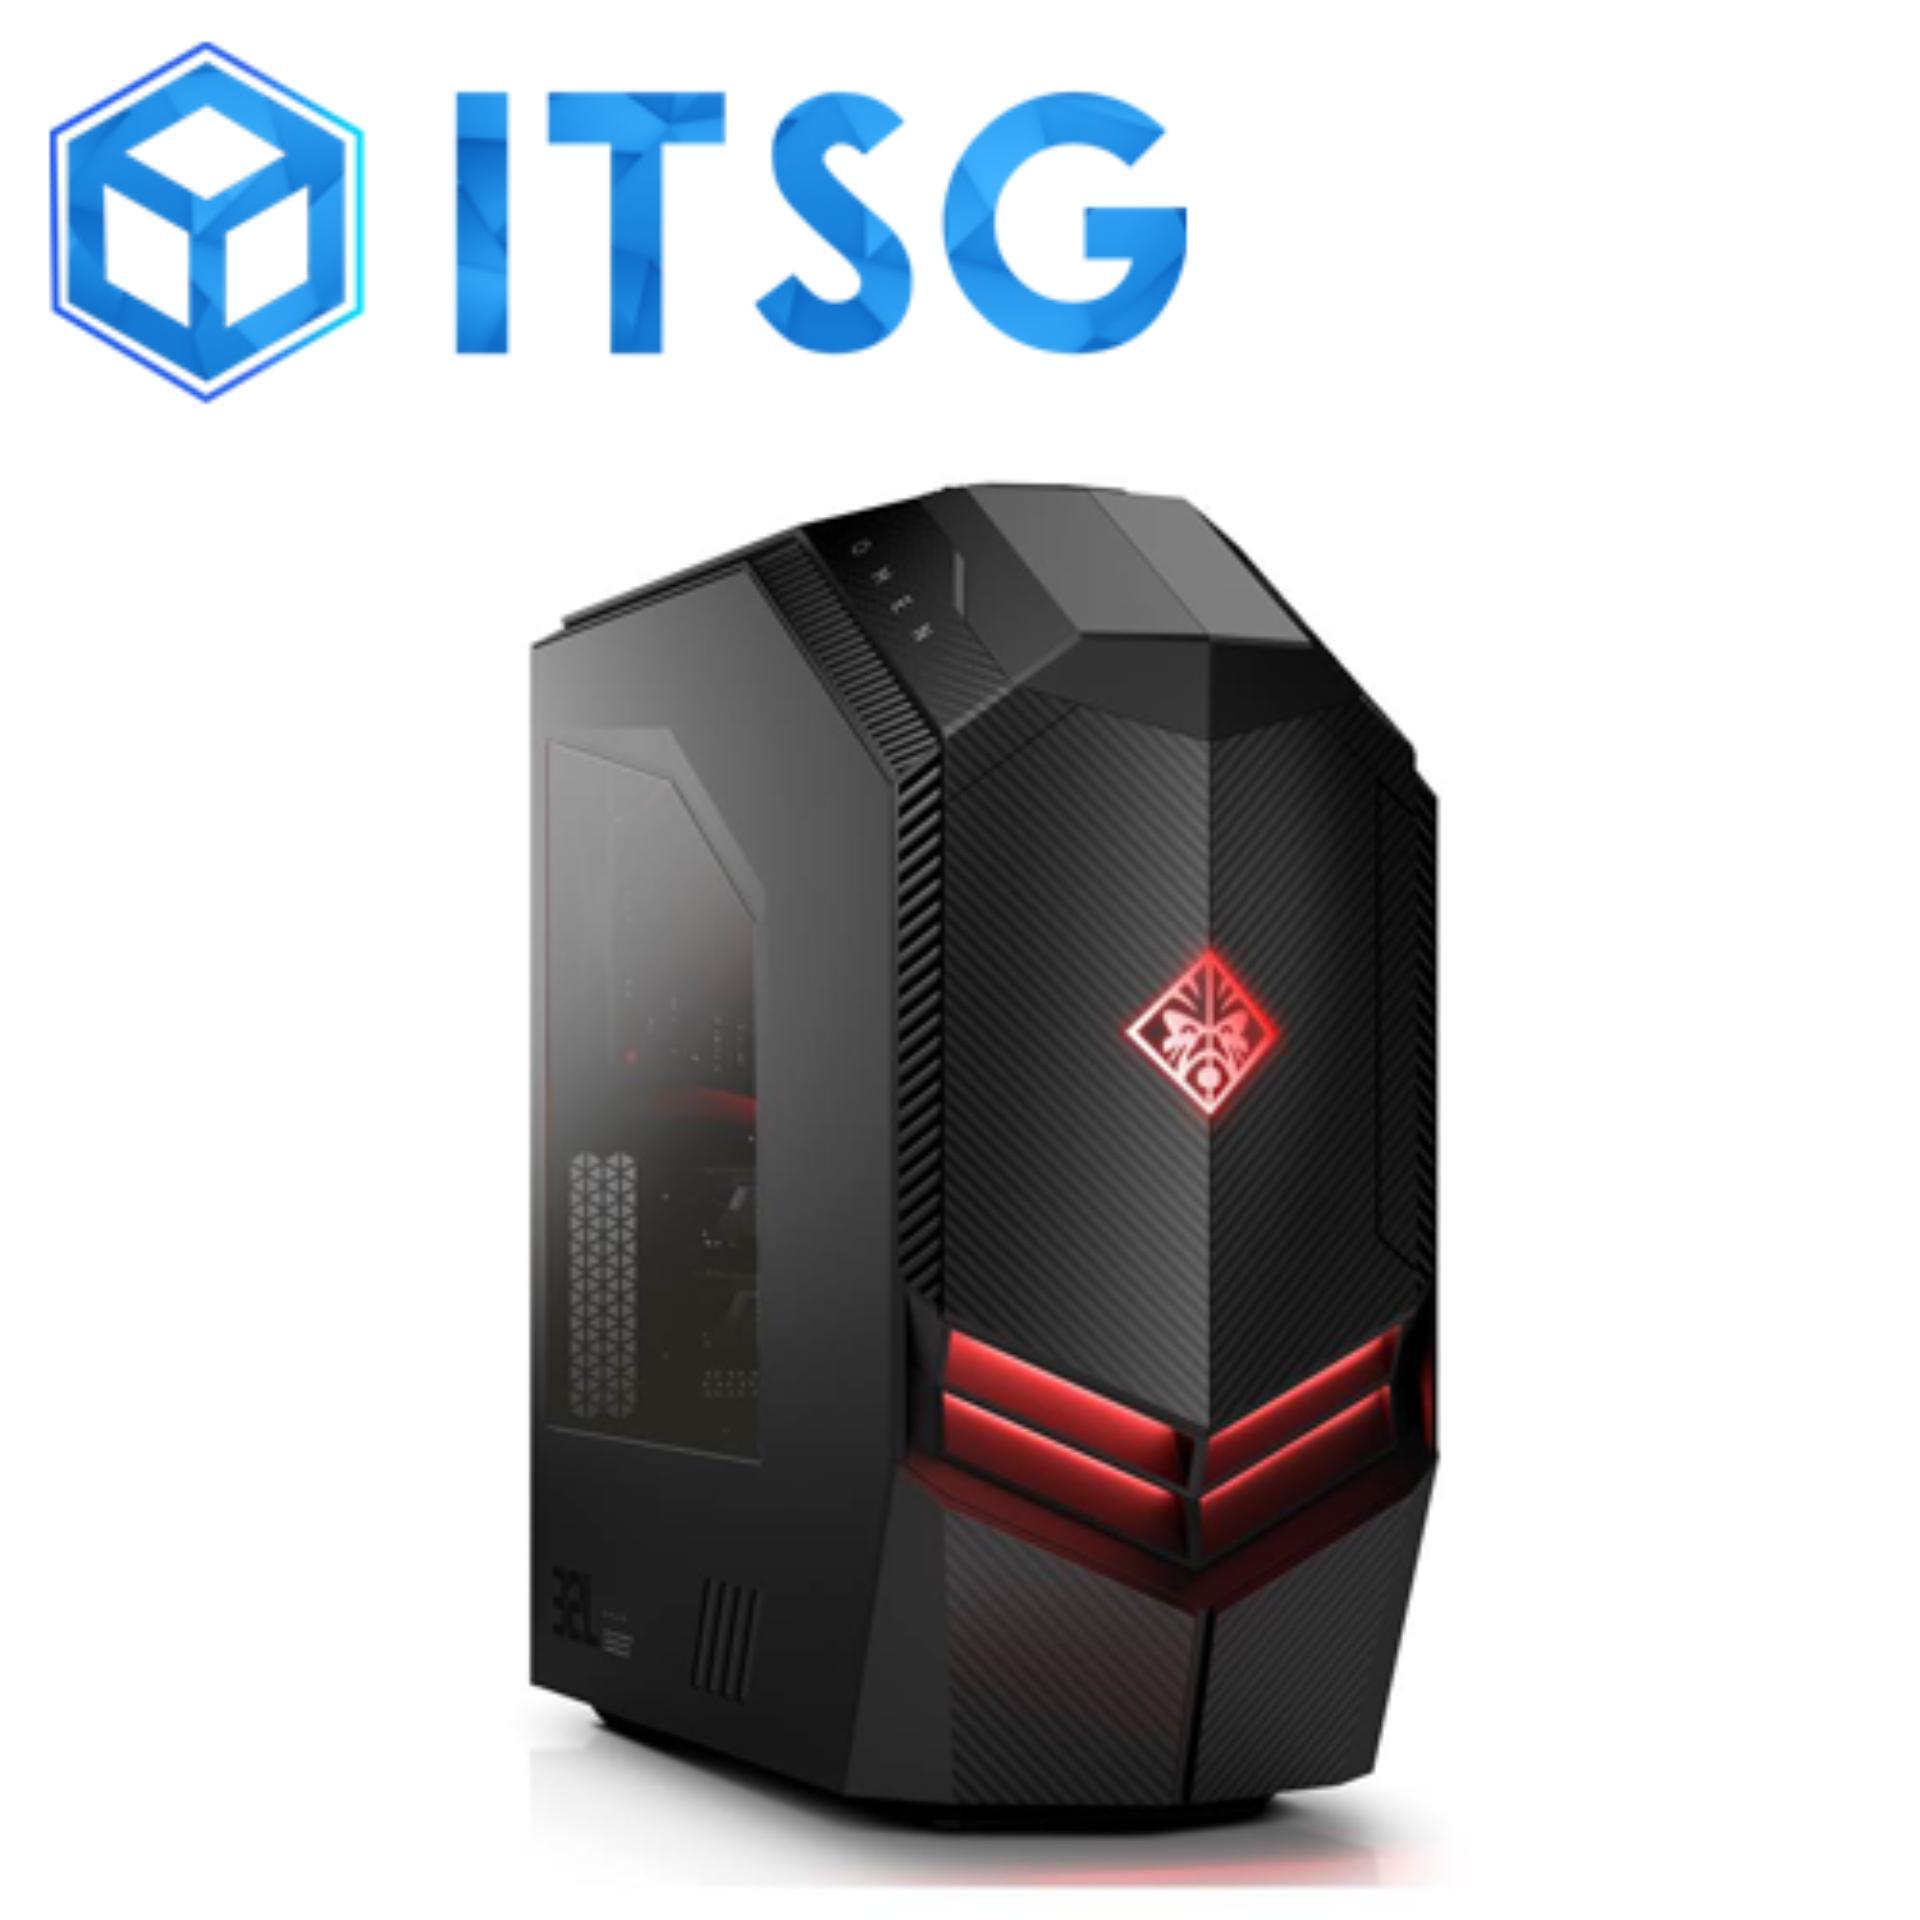 HP Omen Gaming Desktop 880-076d (NEW) / PC / Desktop / Computer / Home Use / Business Use / Windows